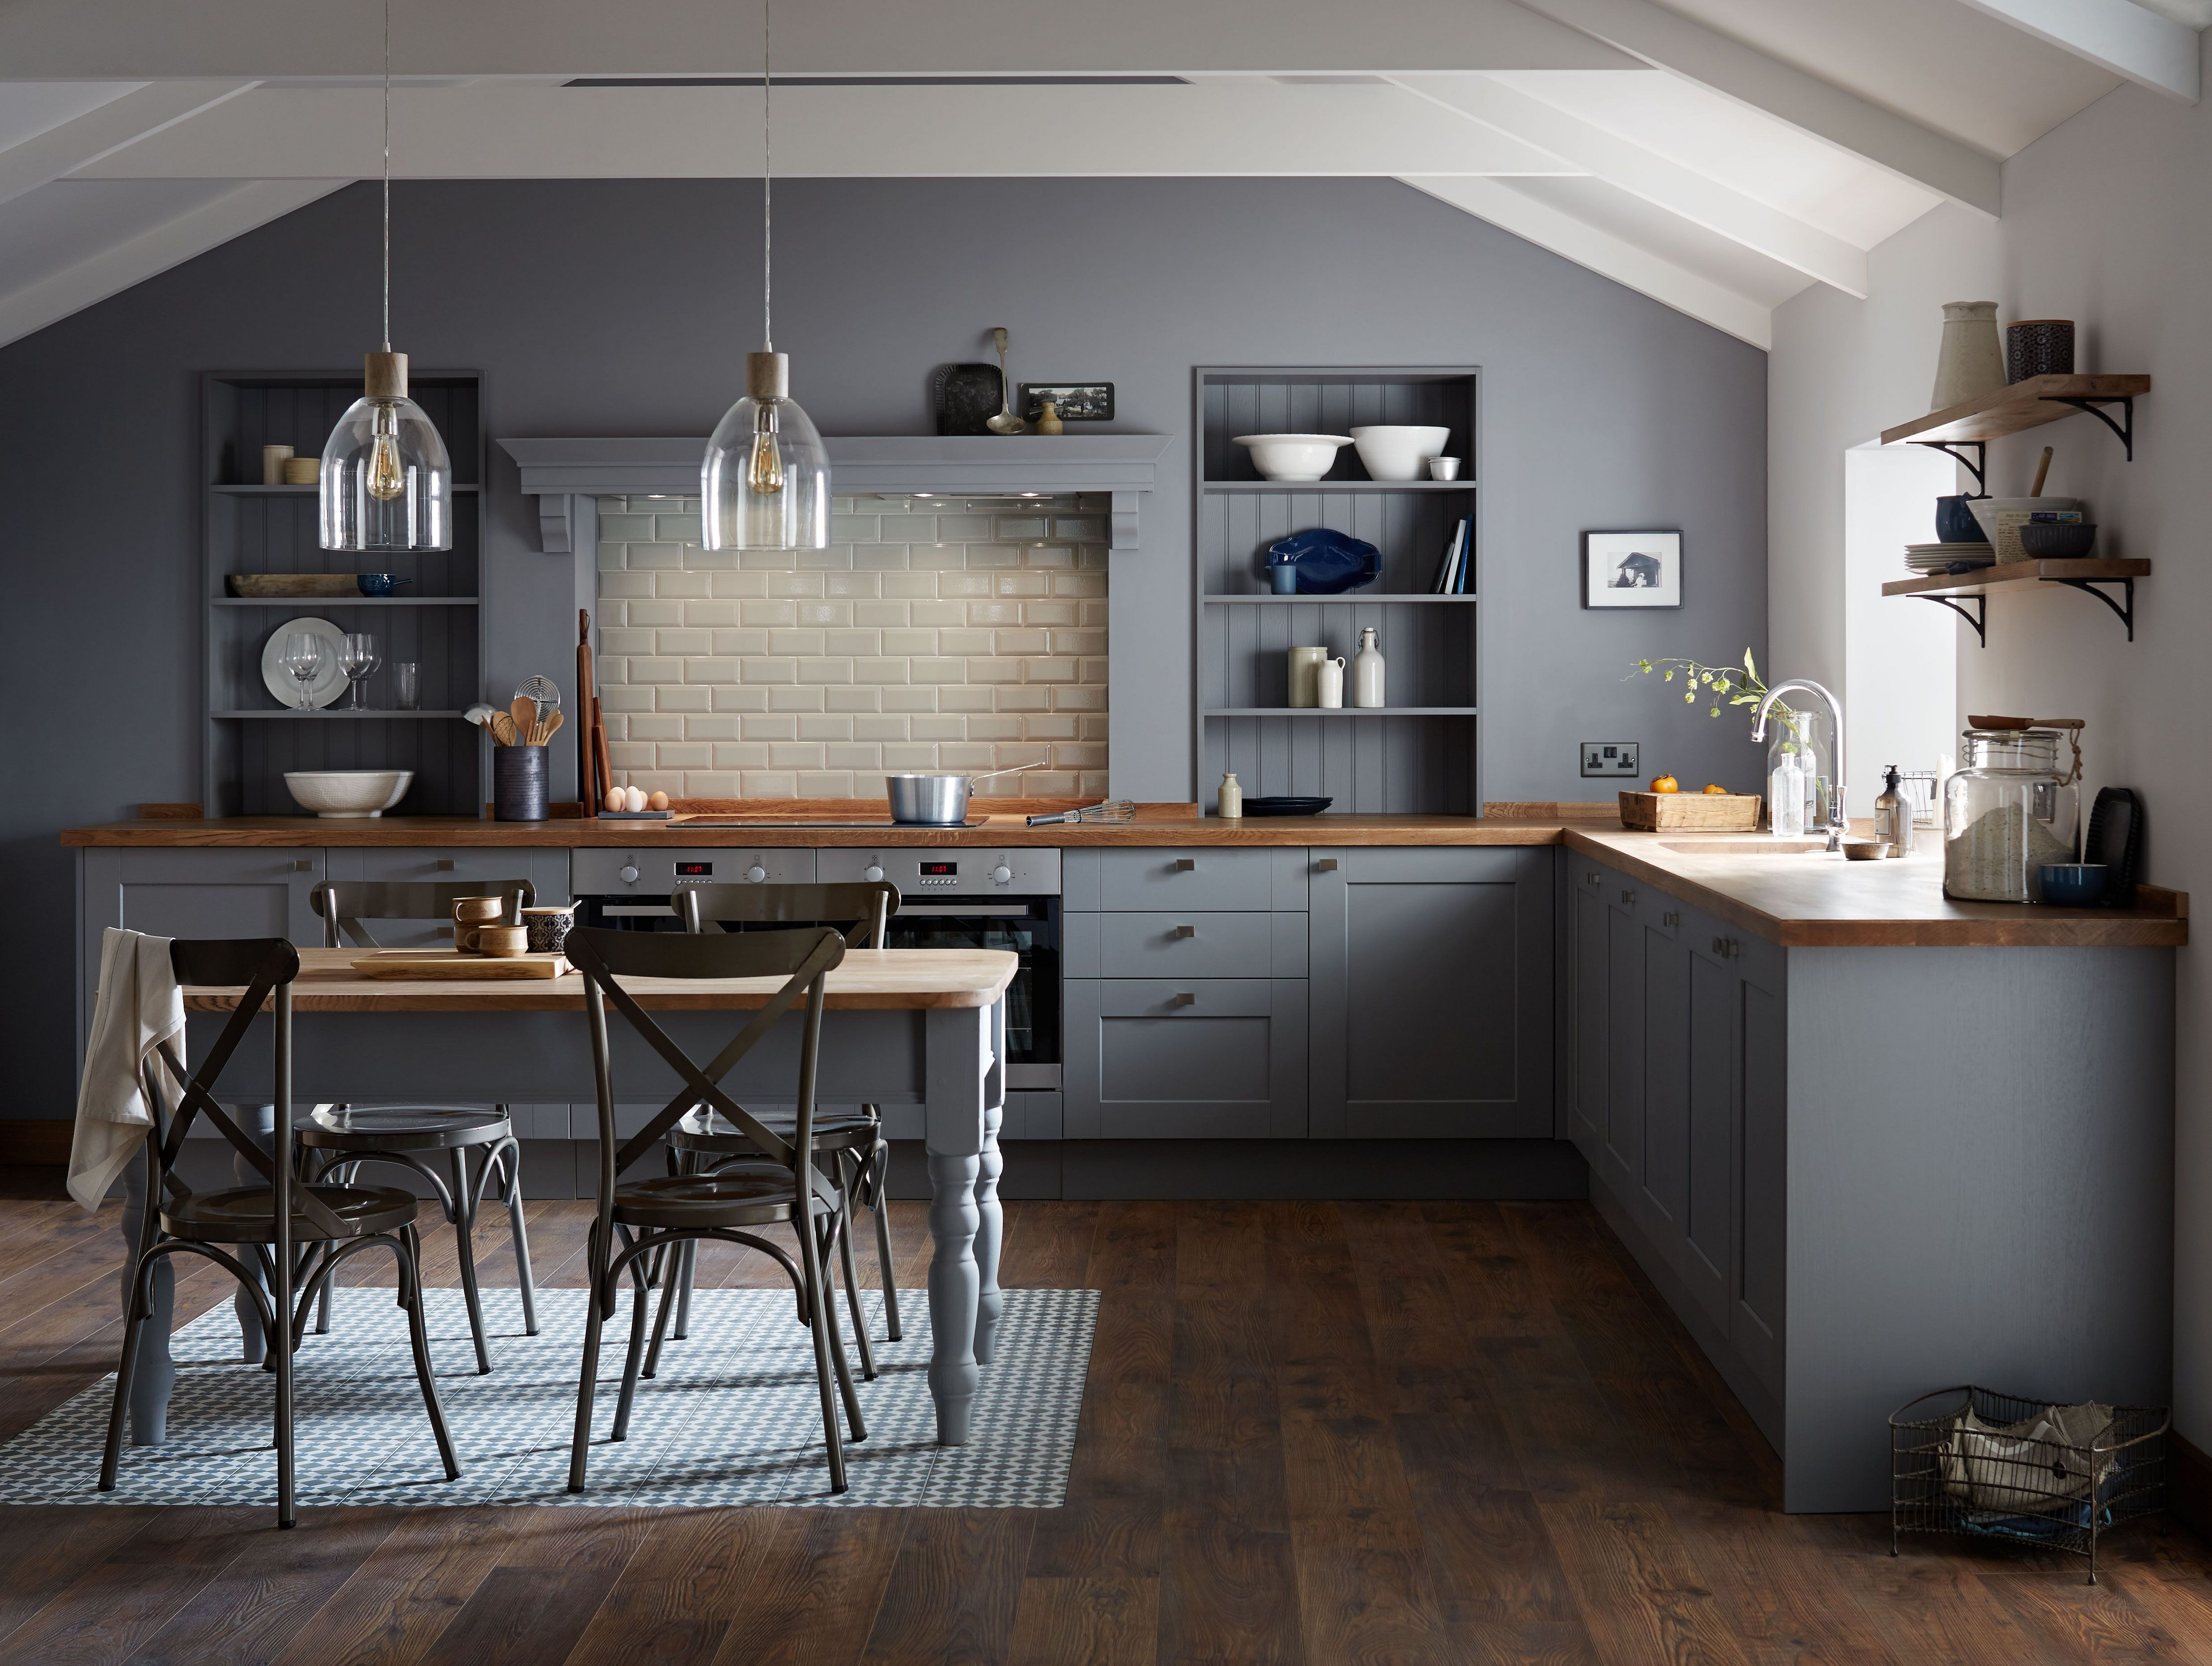 24 Elegant Dark Grey Kitchen Cabinets Paint Colors Ideas Inspira Spaces Grey Kitchen Designs Grey Shaker Kitchen Shaker Style Kitchen Cabinets